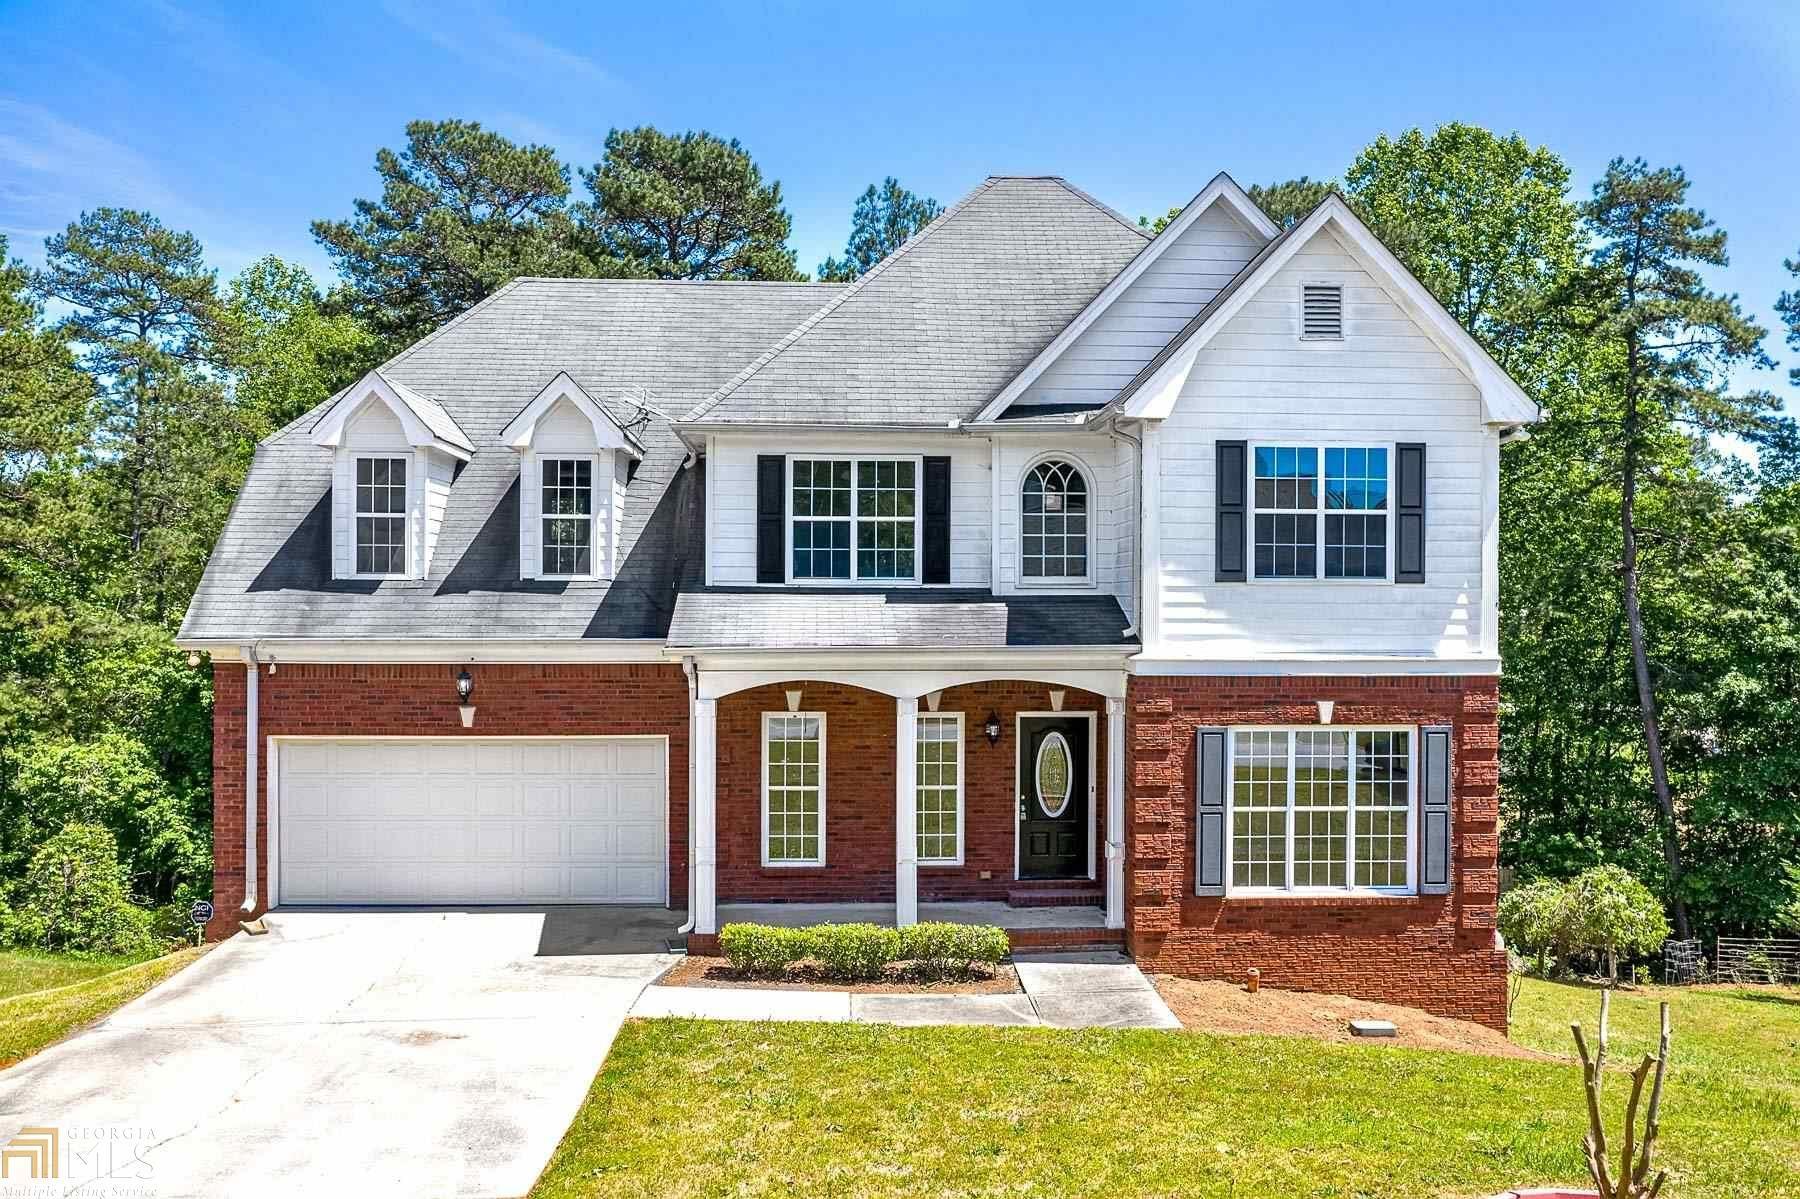 210 Wisteria Blvd, Covington, GA 30016 - MLS#: 8780152